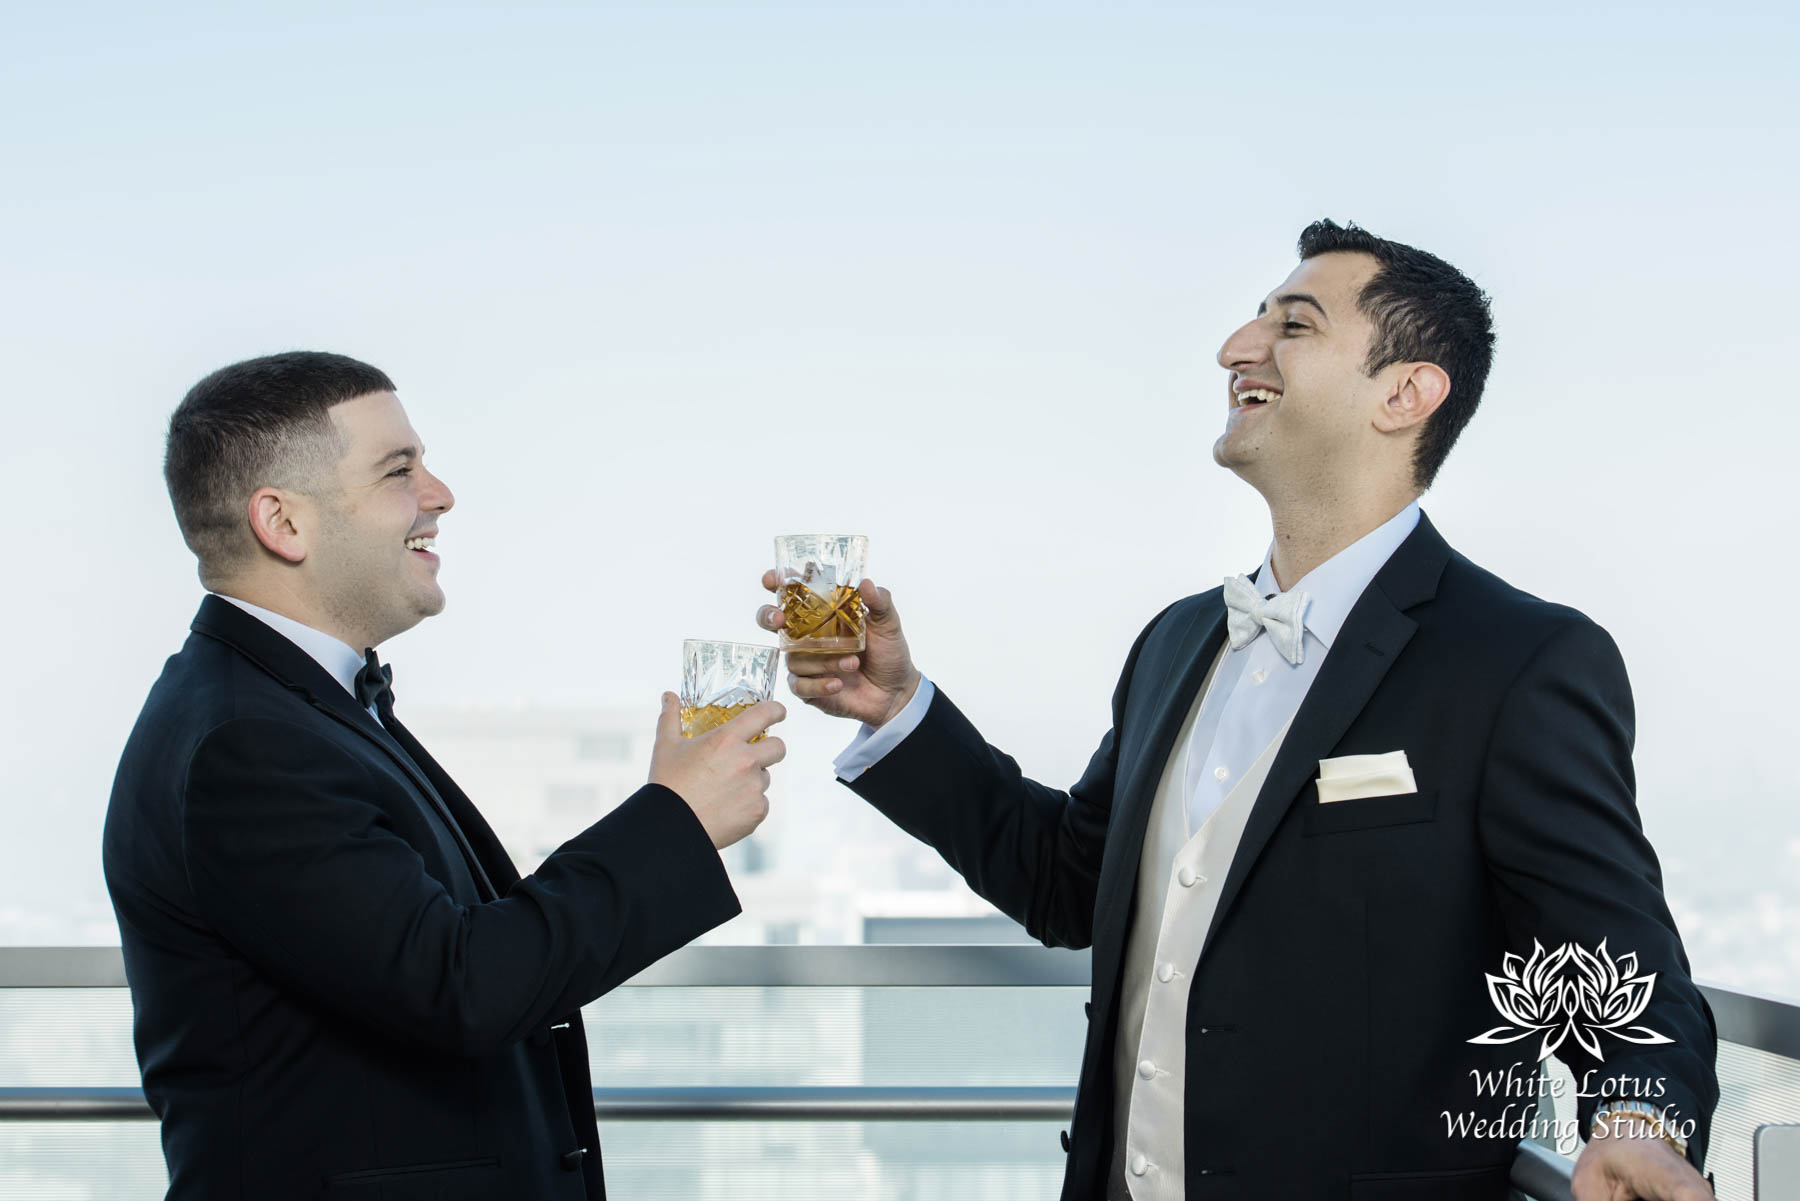 033 - Wedding - Toronto - Groom getting ready - WP